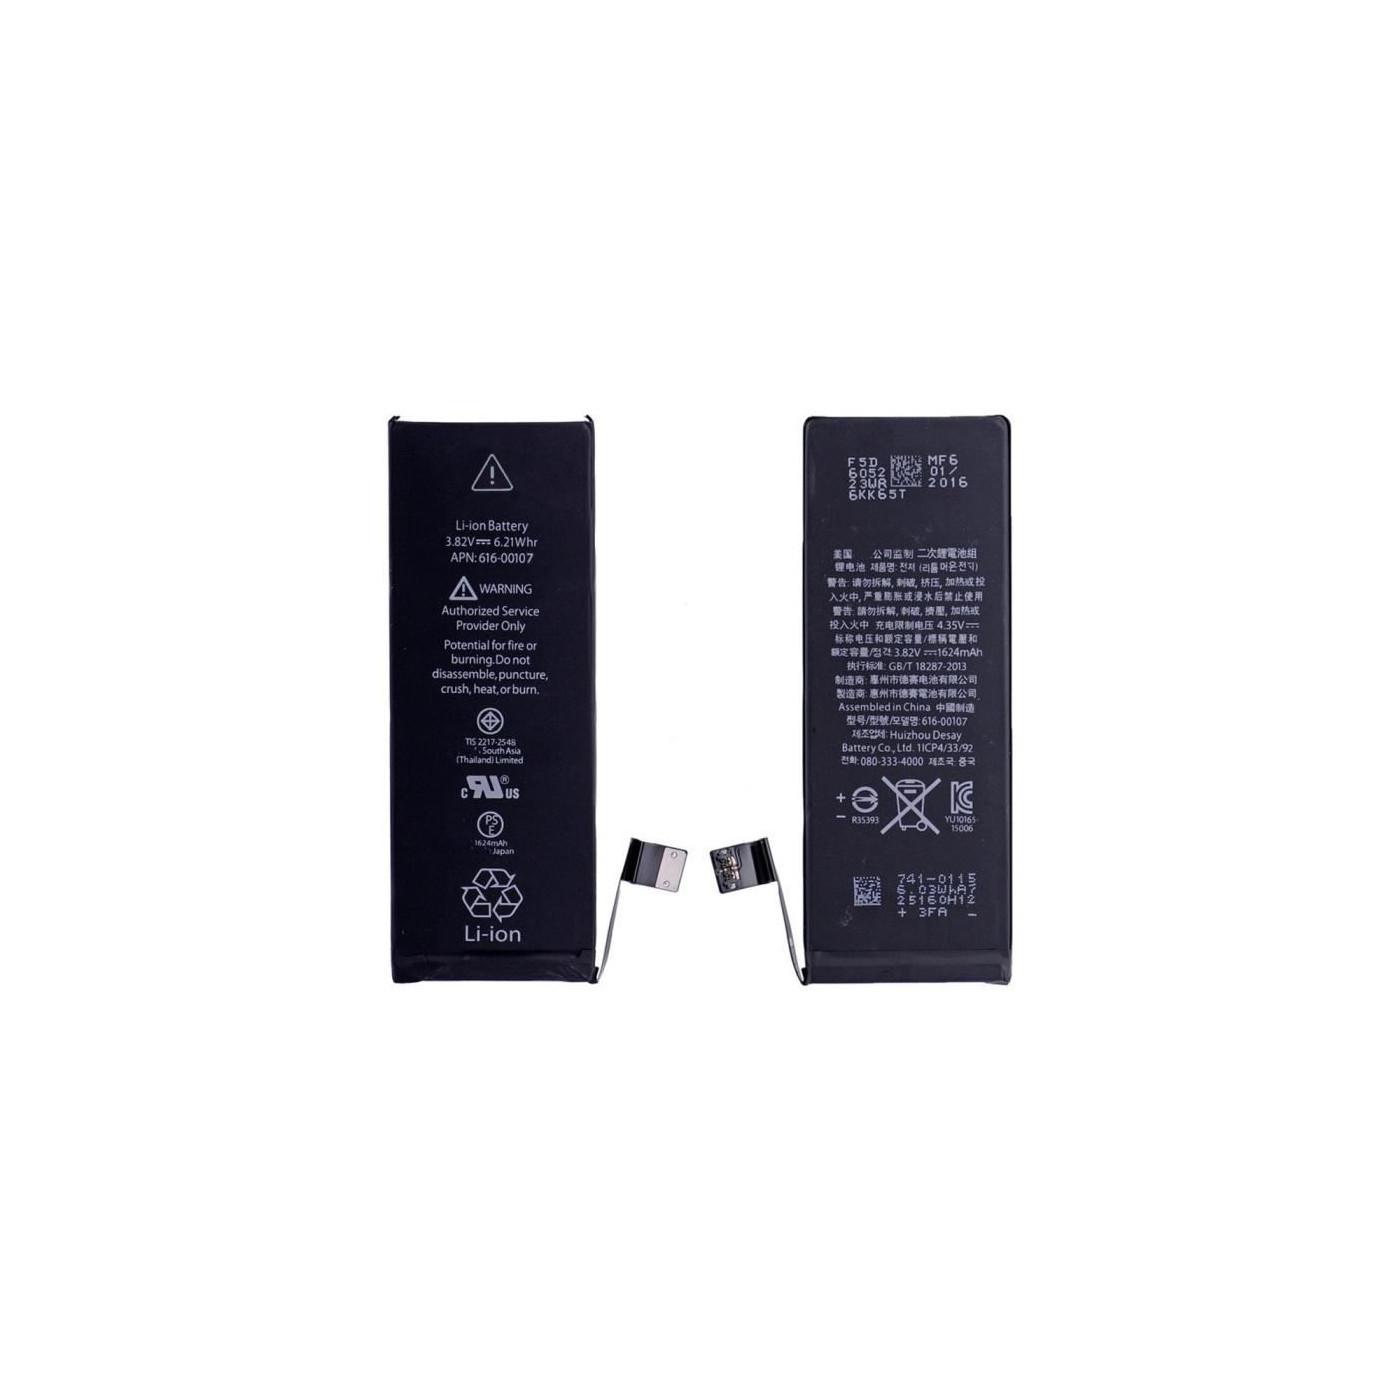 Batteria di ricambio per apple iphone SE 1624 mah